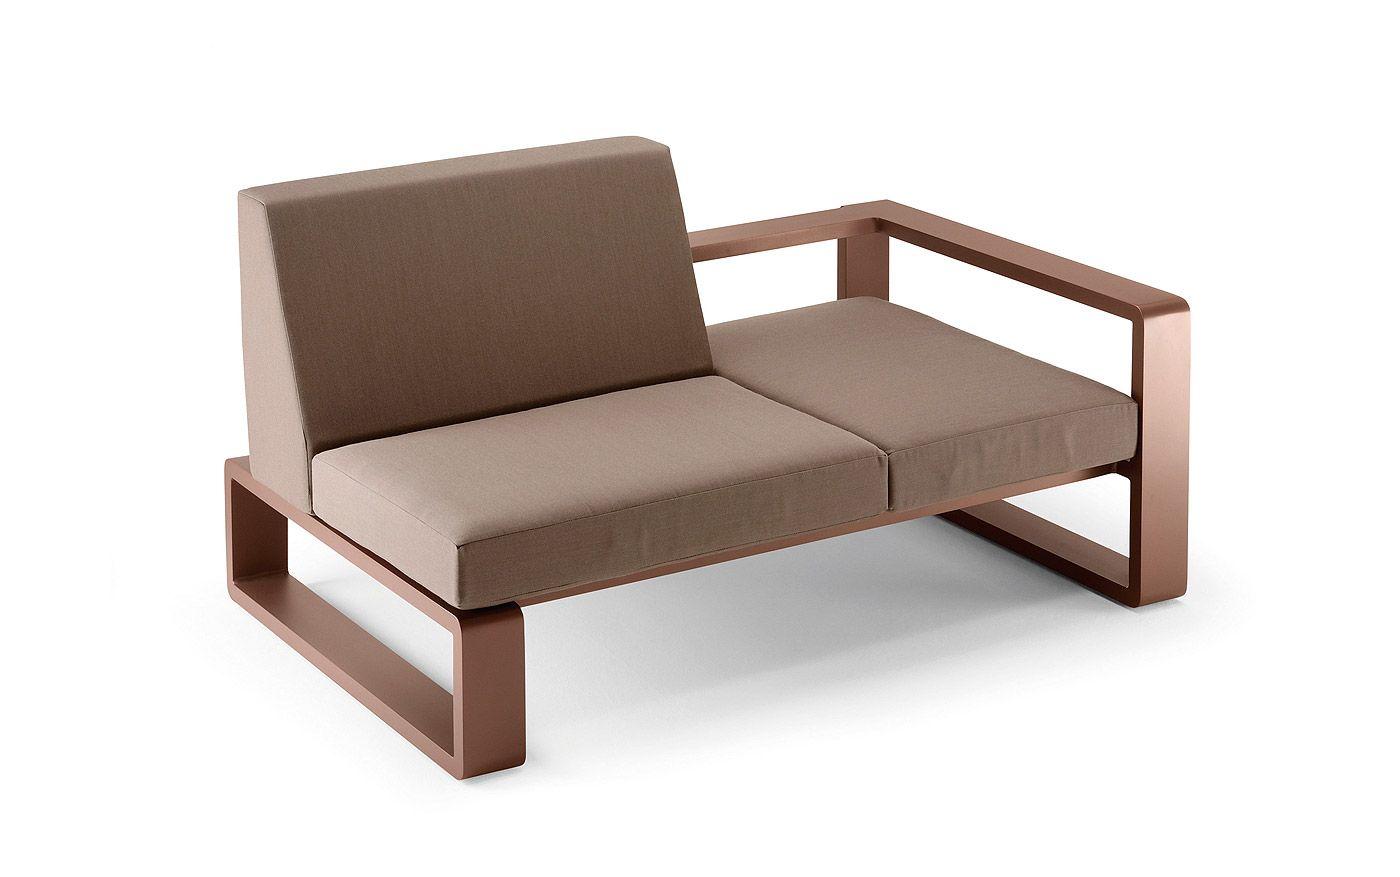 kama lounger - möbel / gartenmöbel / gartensitzmöbel - neben den